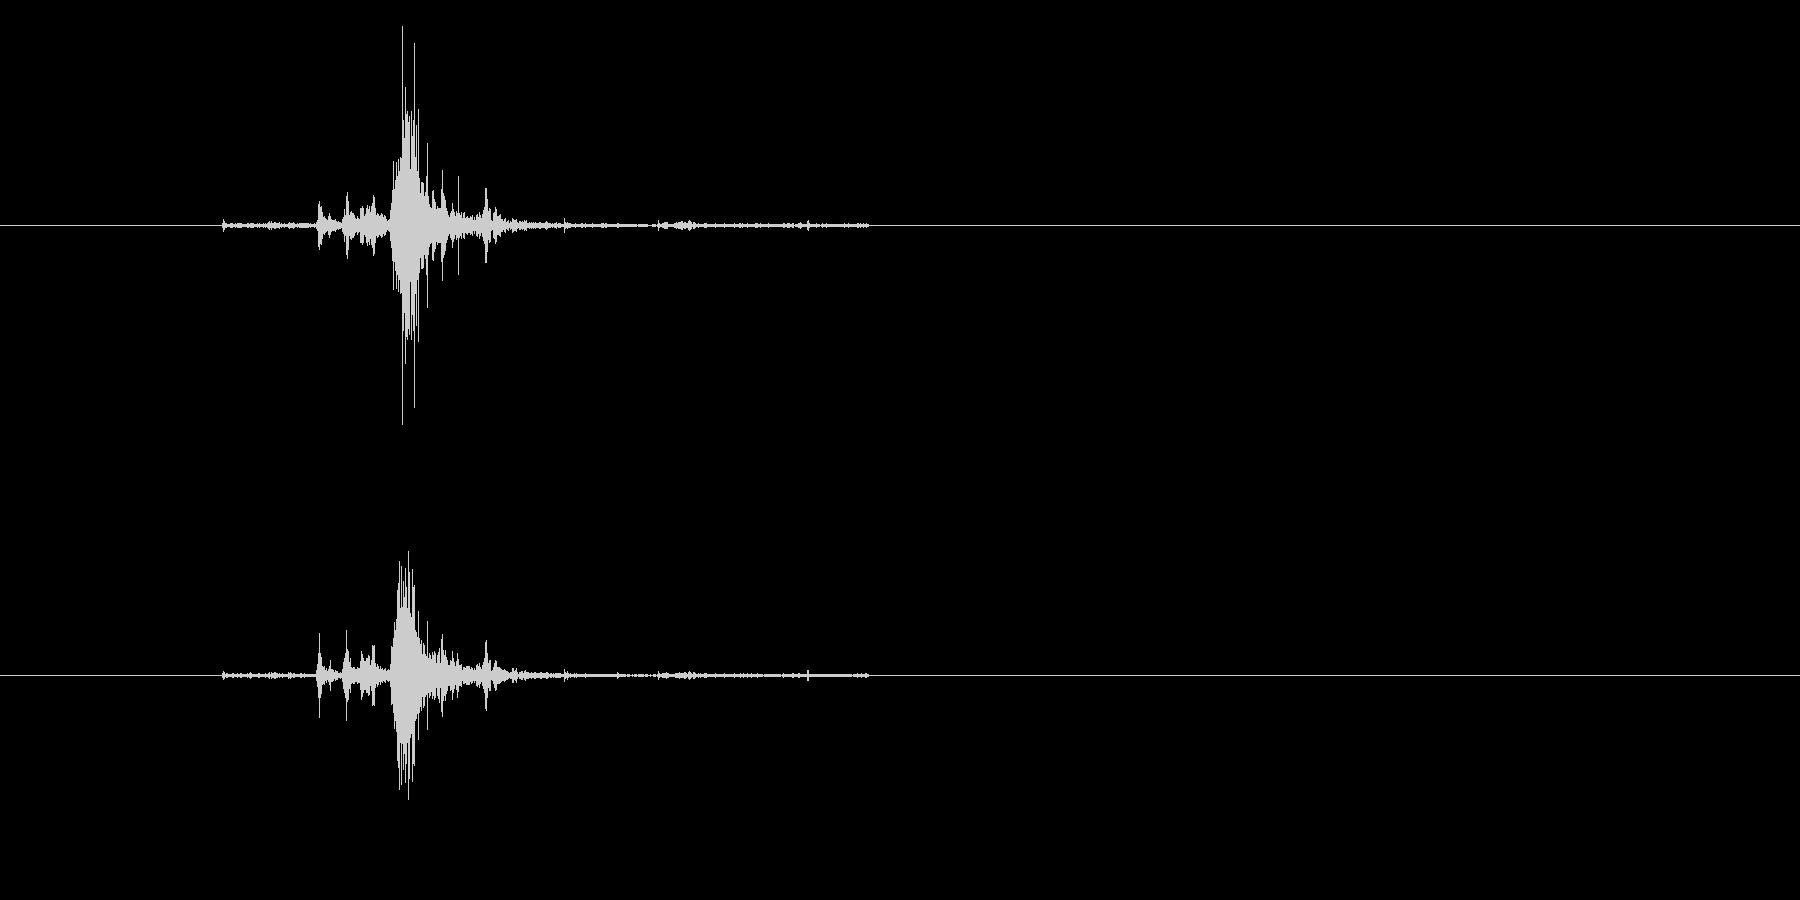 ZIPPO(ジッポ)の着火音 真鍮無垢の未再生の波形